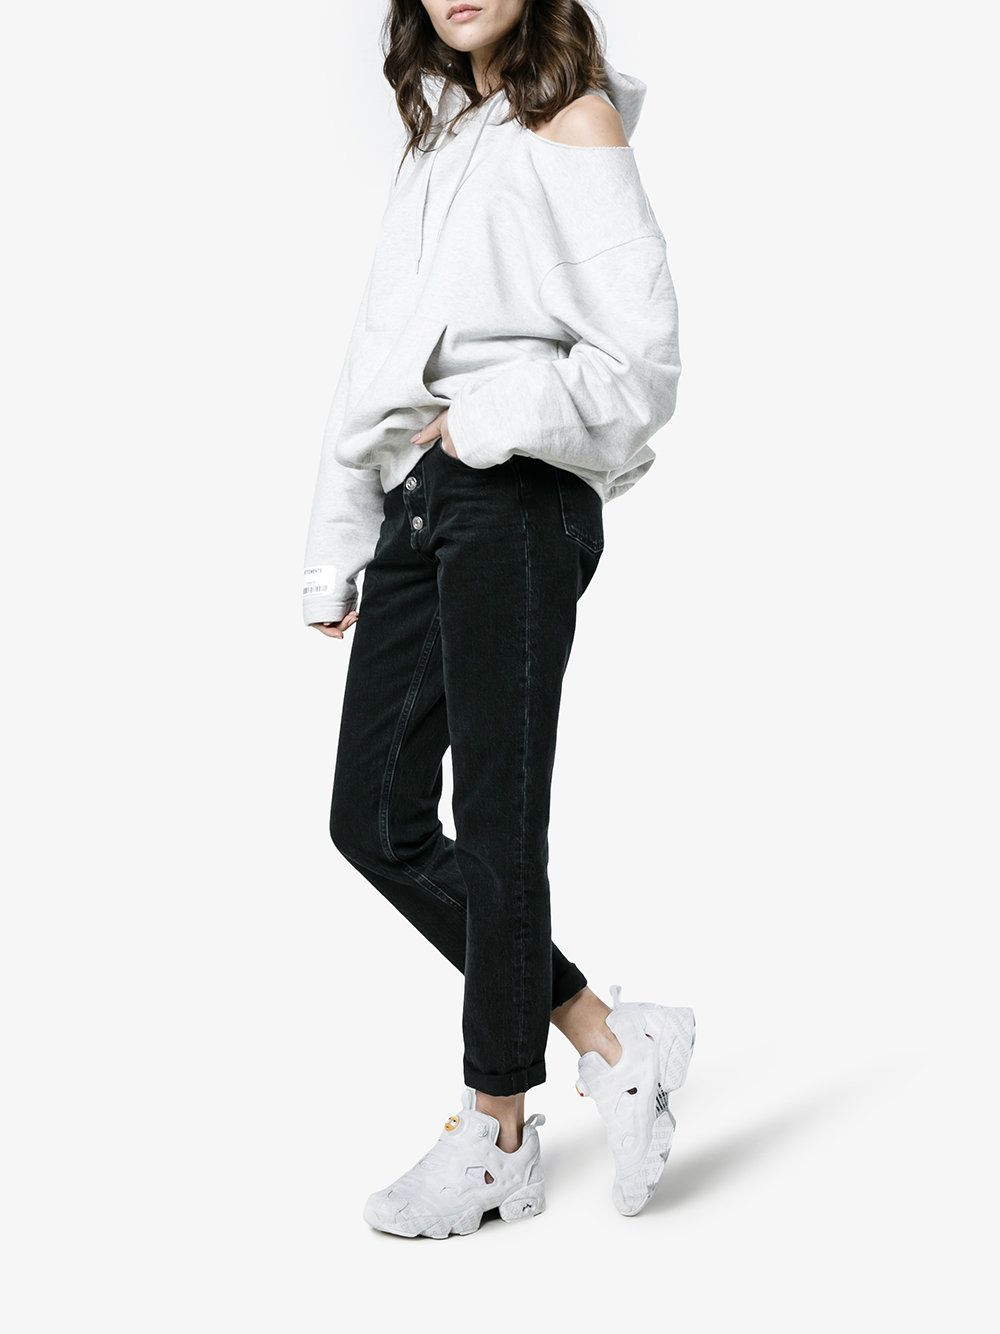 Vetements x Reebok Instapump Fury sneakers | Reebok, Fashion